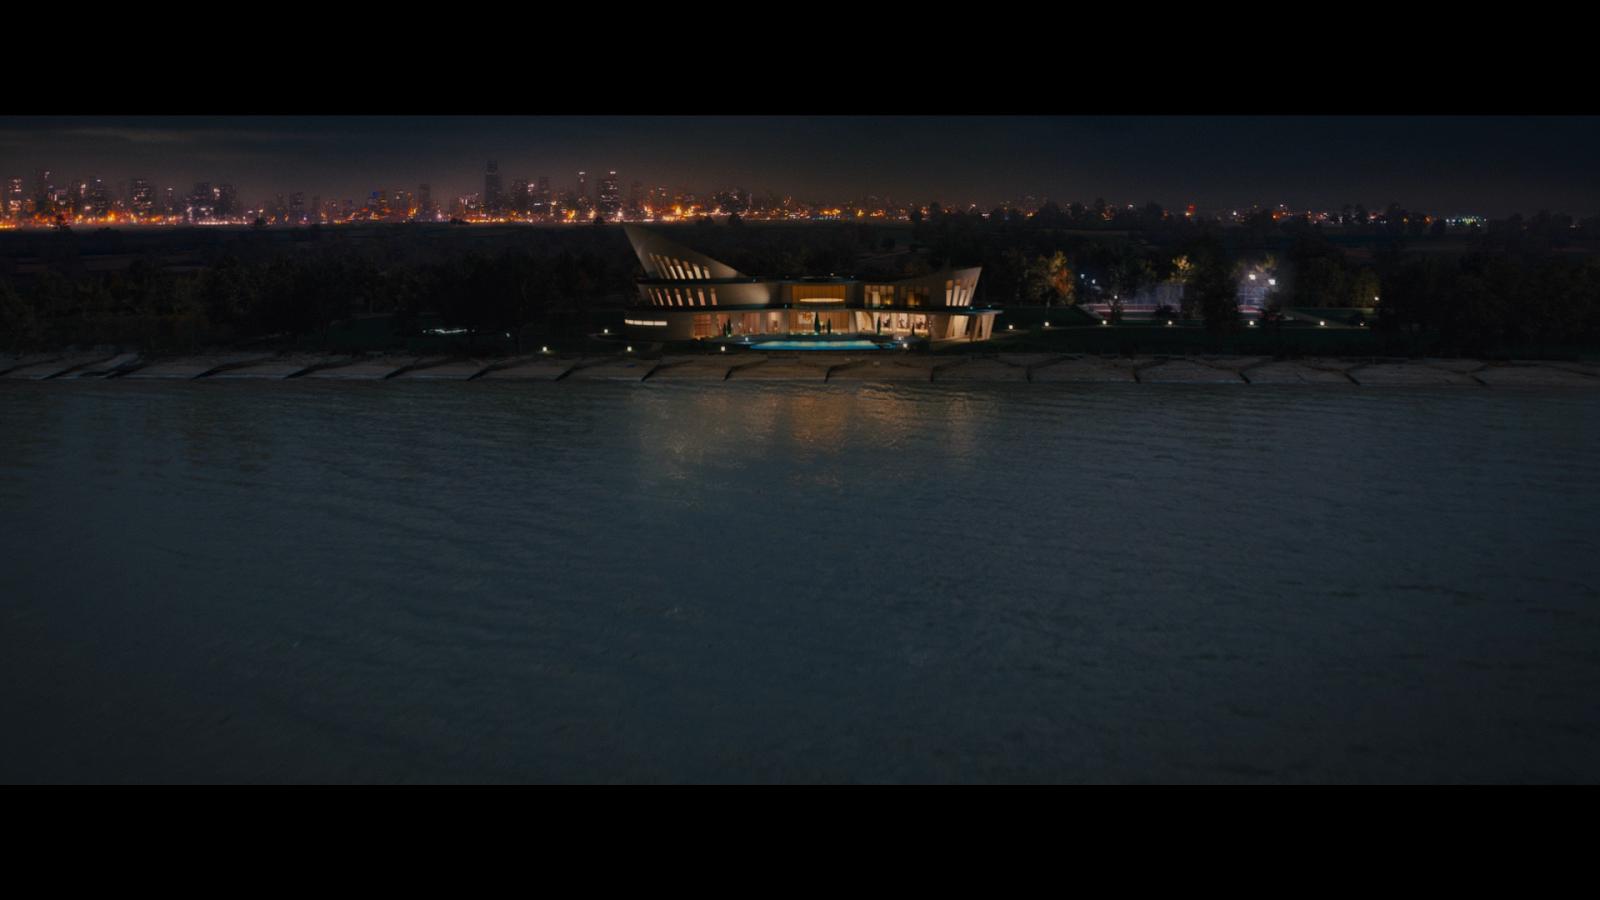 Kingsman El Servicio Secreto (2015) 1080p BD25 6